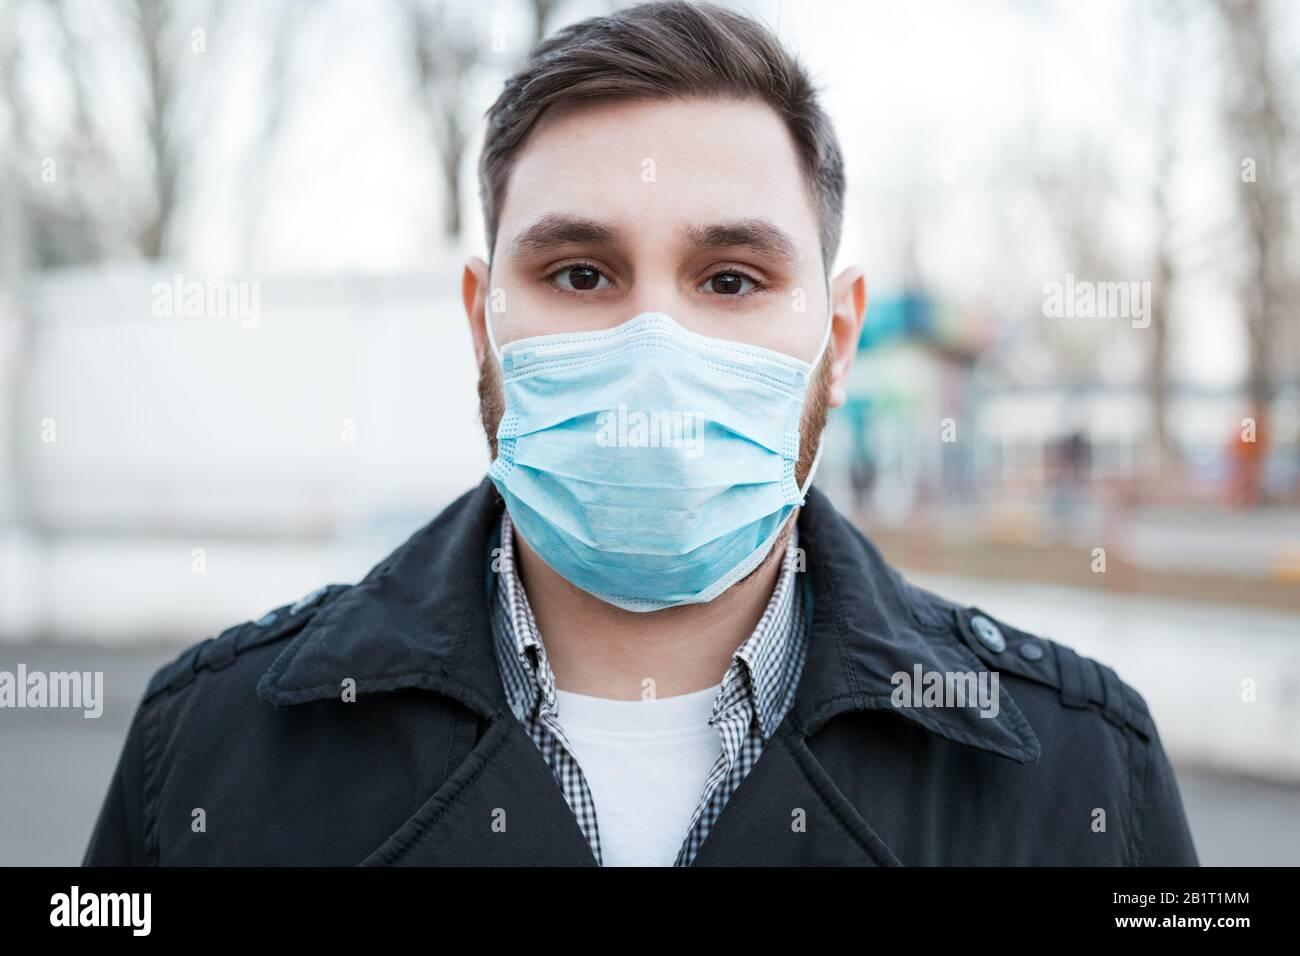 masque respiratoire hygienique